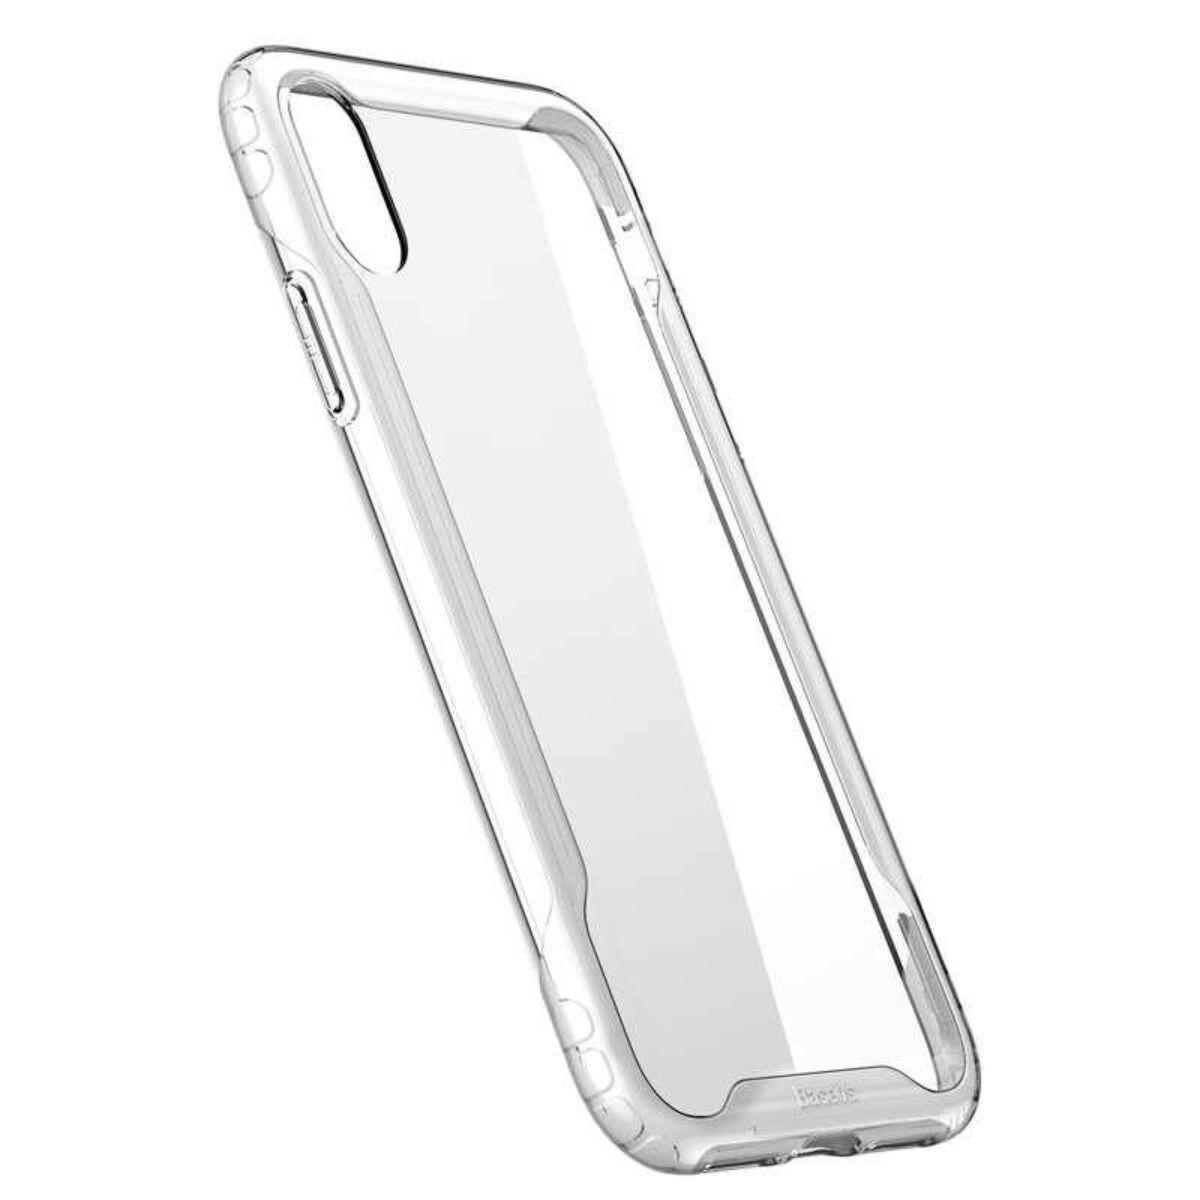 Baseus iPhone XS Max tok, Armor, fehér (WIAPIPH65-YJ02)